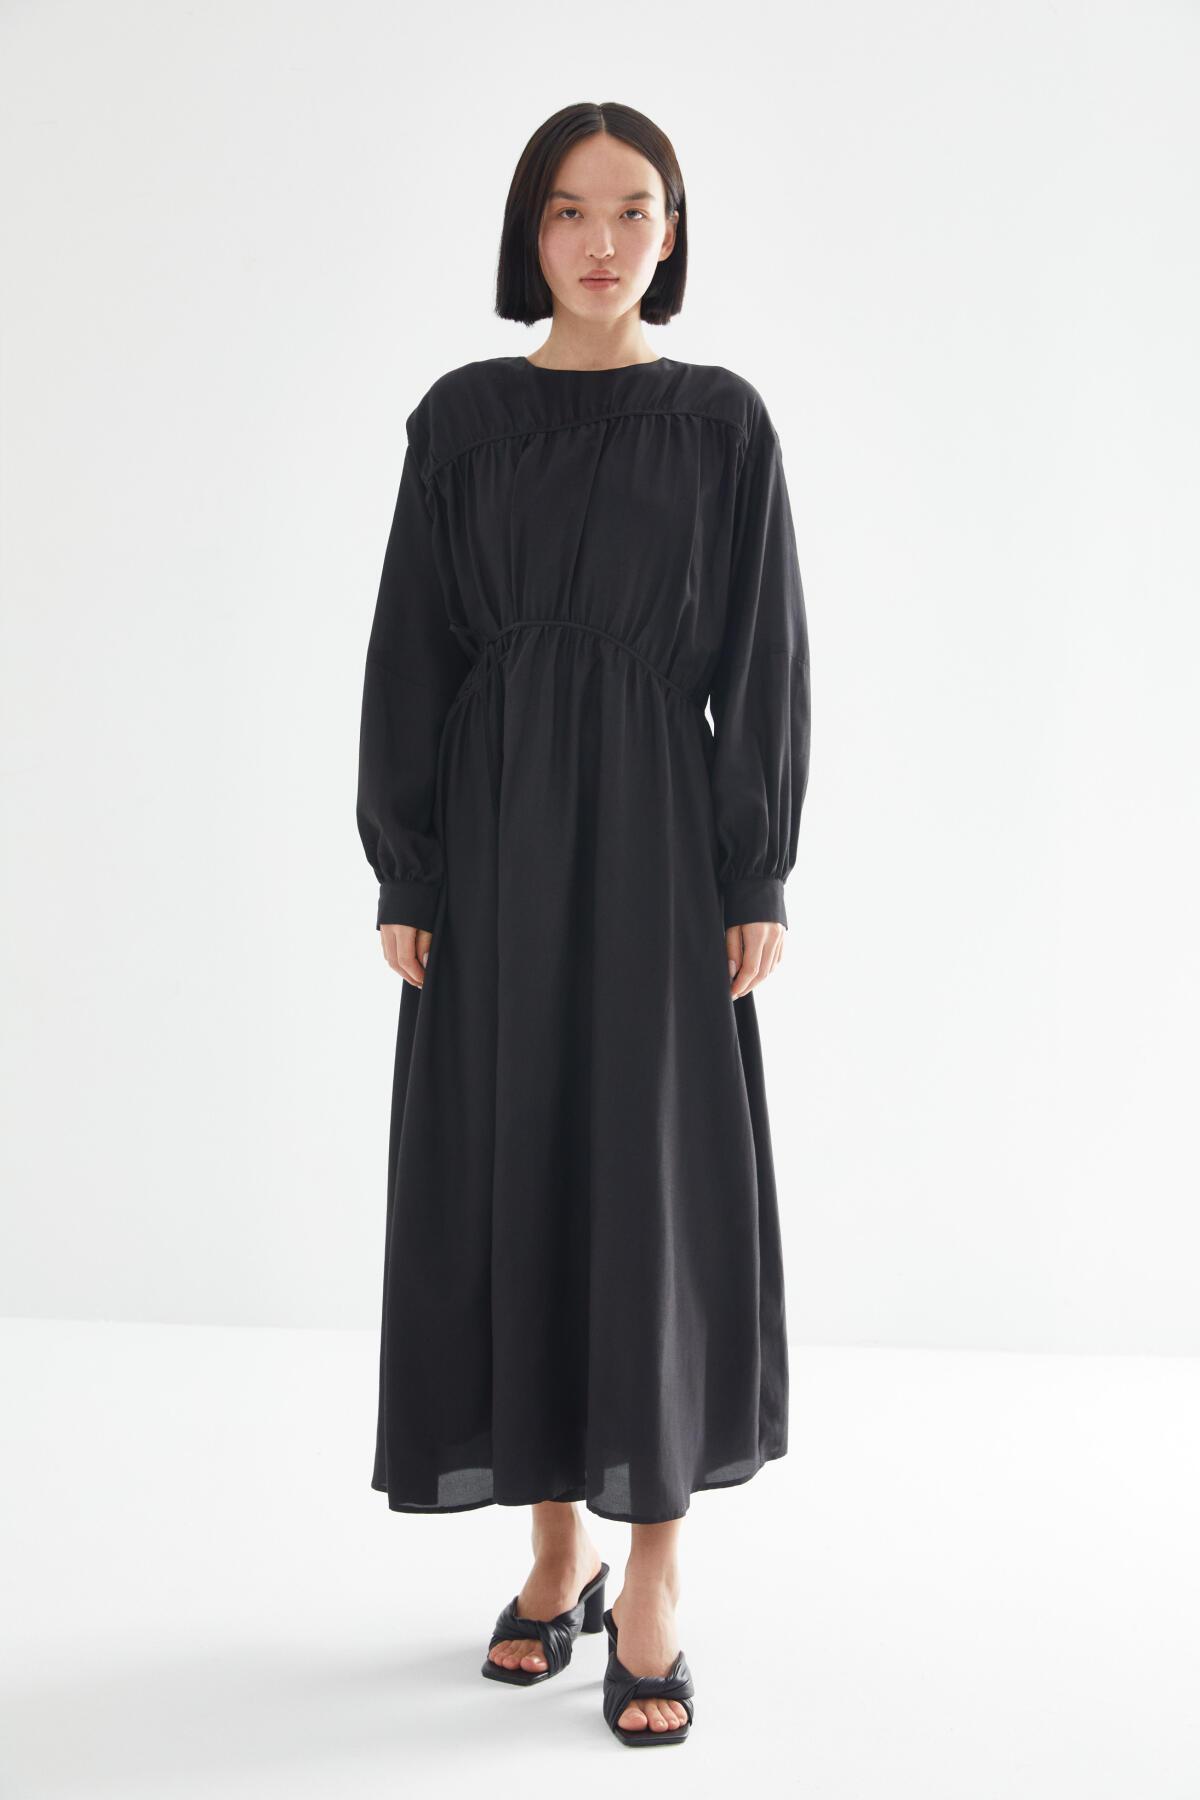 Kevser Sarıoğlu - TIE LINED DRESS